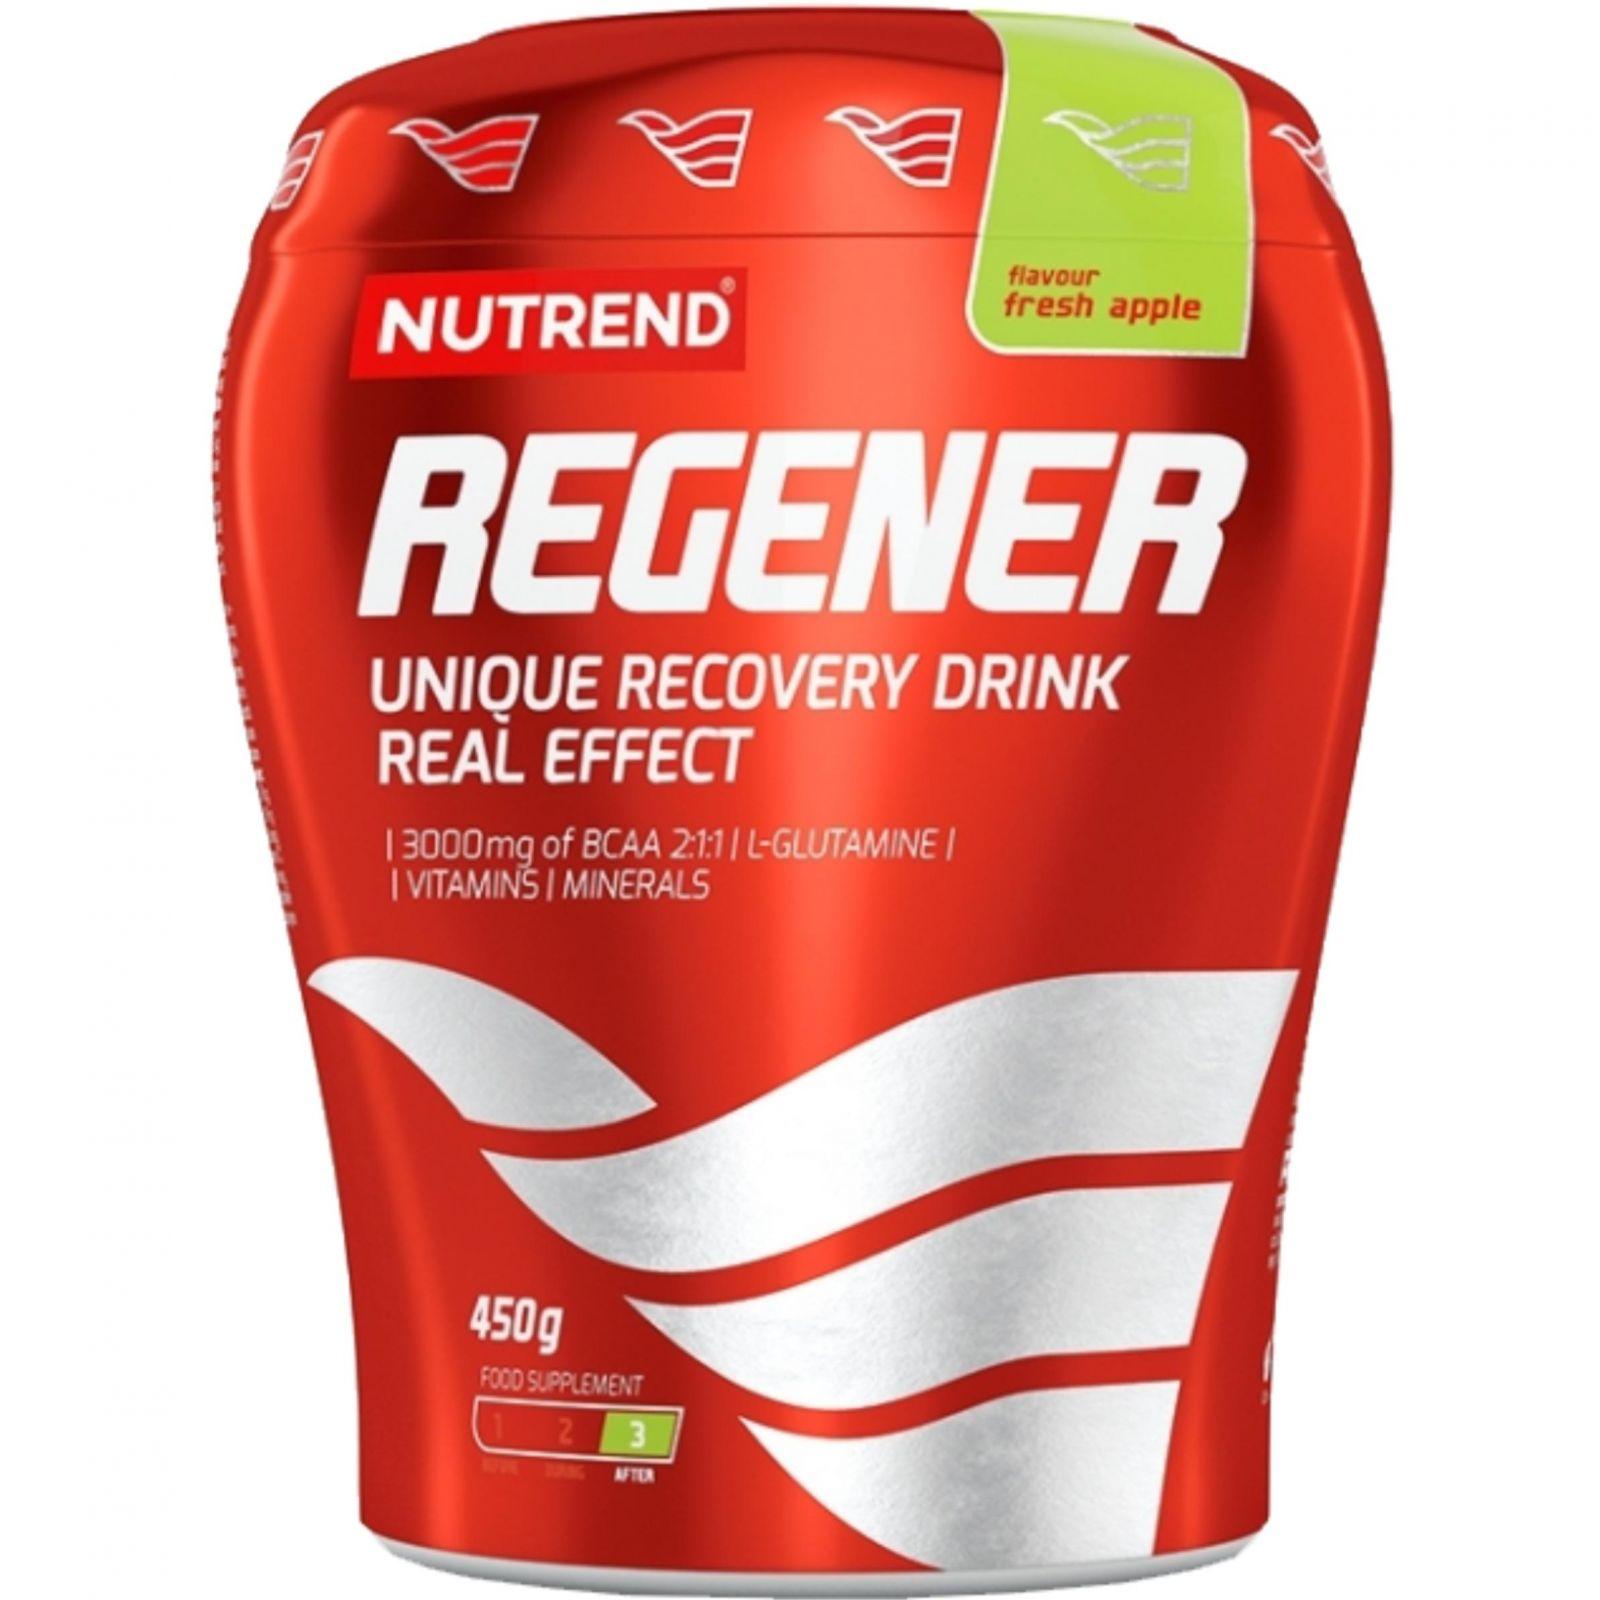 Nutrend REGENER unique recovery drink, fresh apple, 450 g